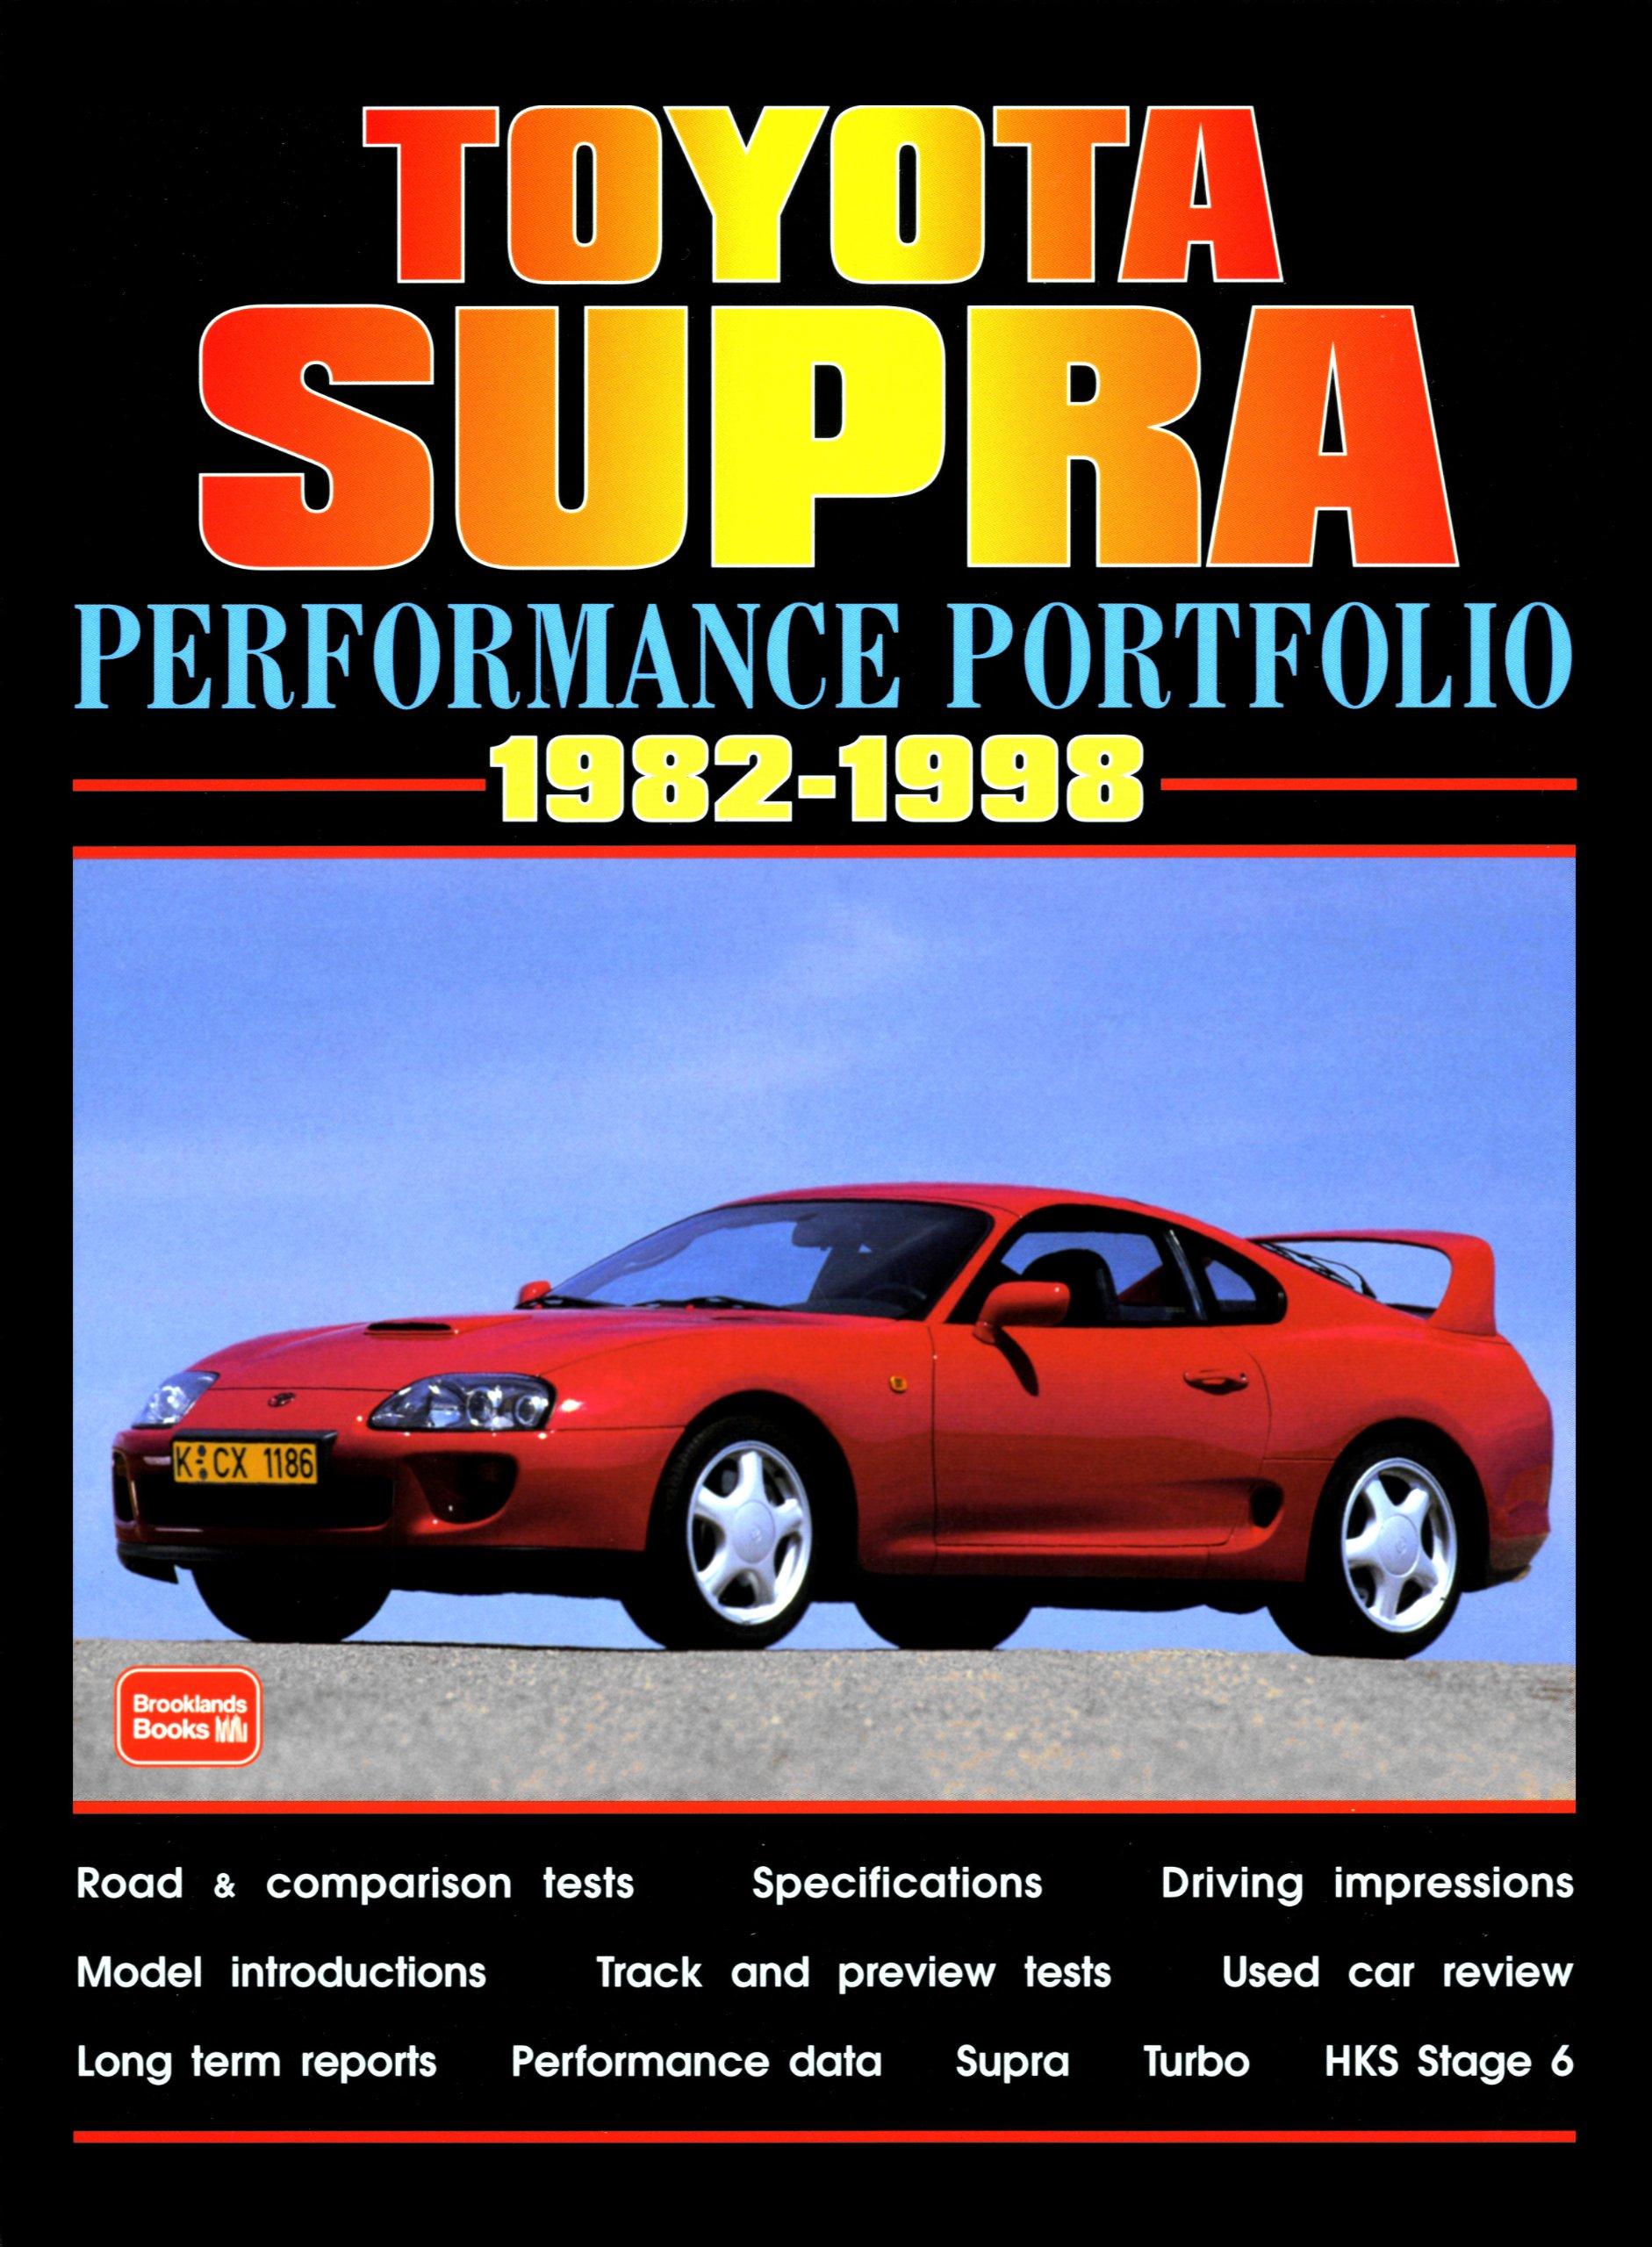 Toyota Supra Performance Portfolio 1982-1998 Performsnce Portfolio: Amazon.es: R. M. Clarke: Libros en idiomas extranjeros